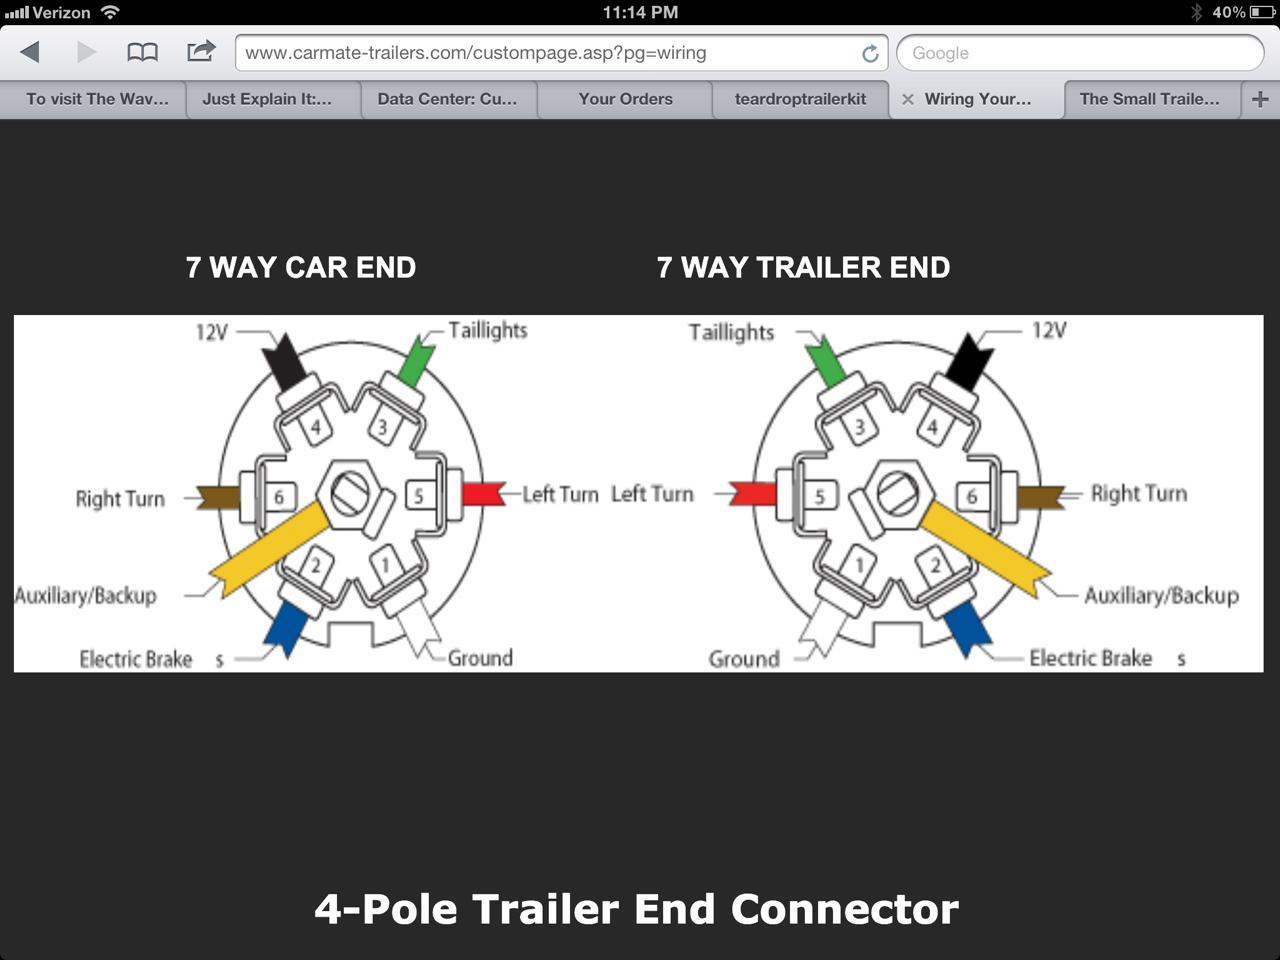 karr 4040a alarm electrical wiring diagram karr karr alarm installation manual related keywords suggestions on karr 4040a alarm electrical wiring diagram